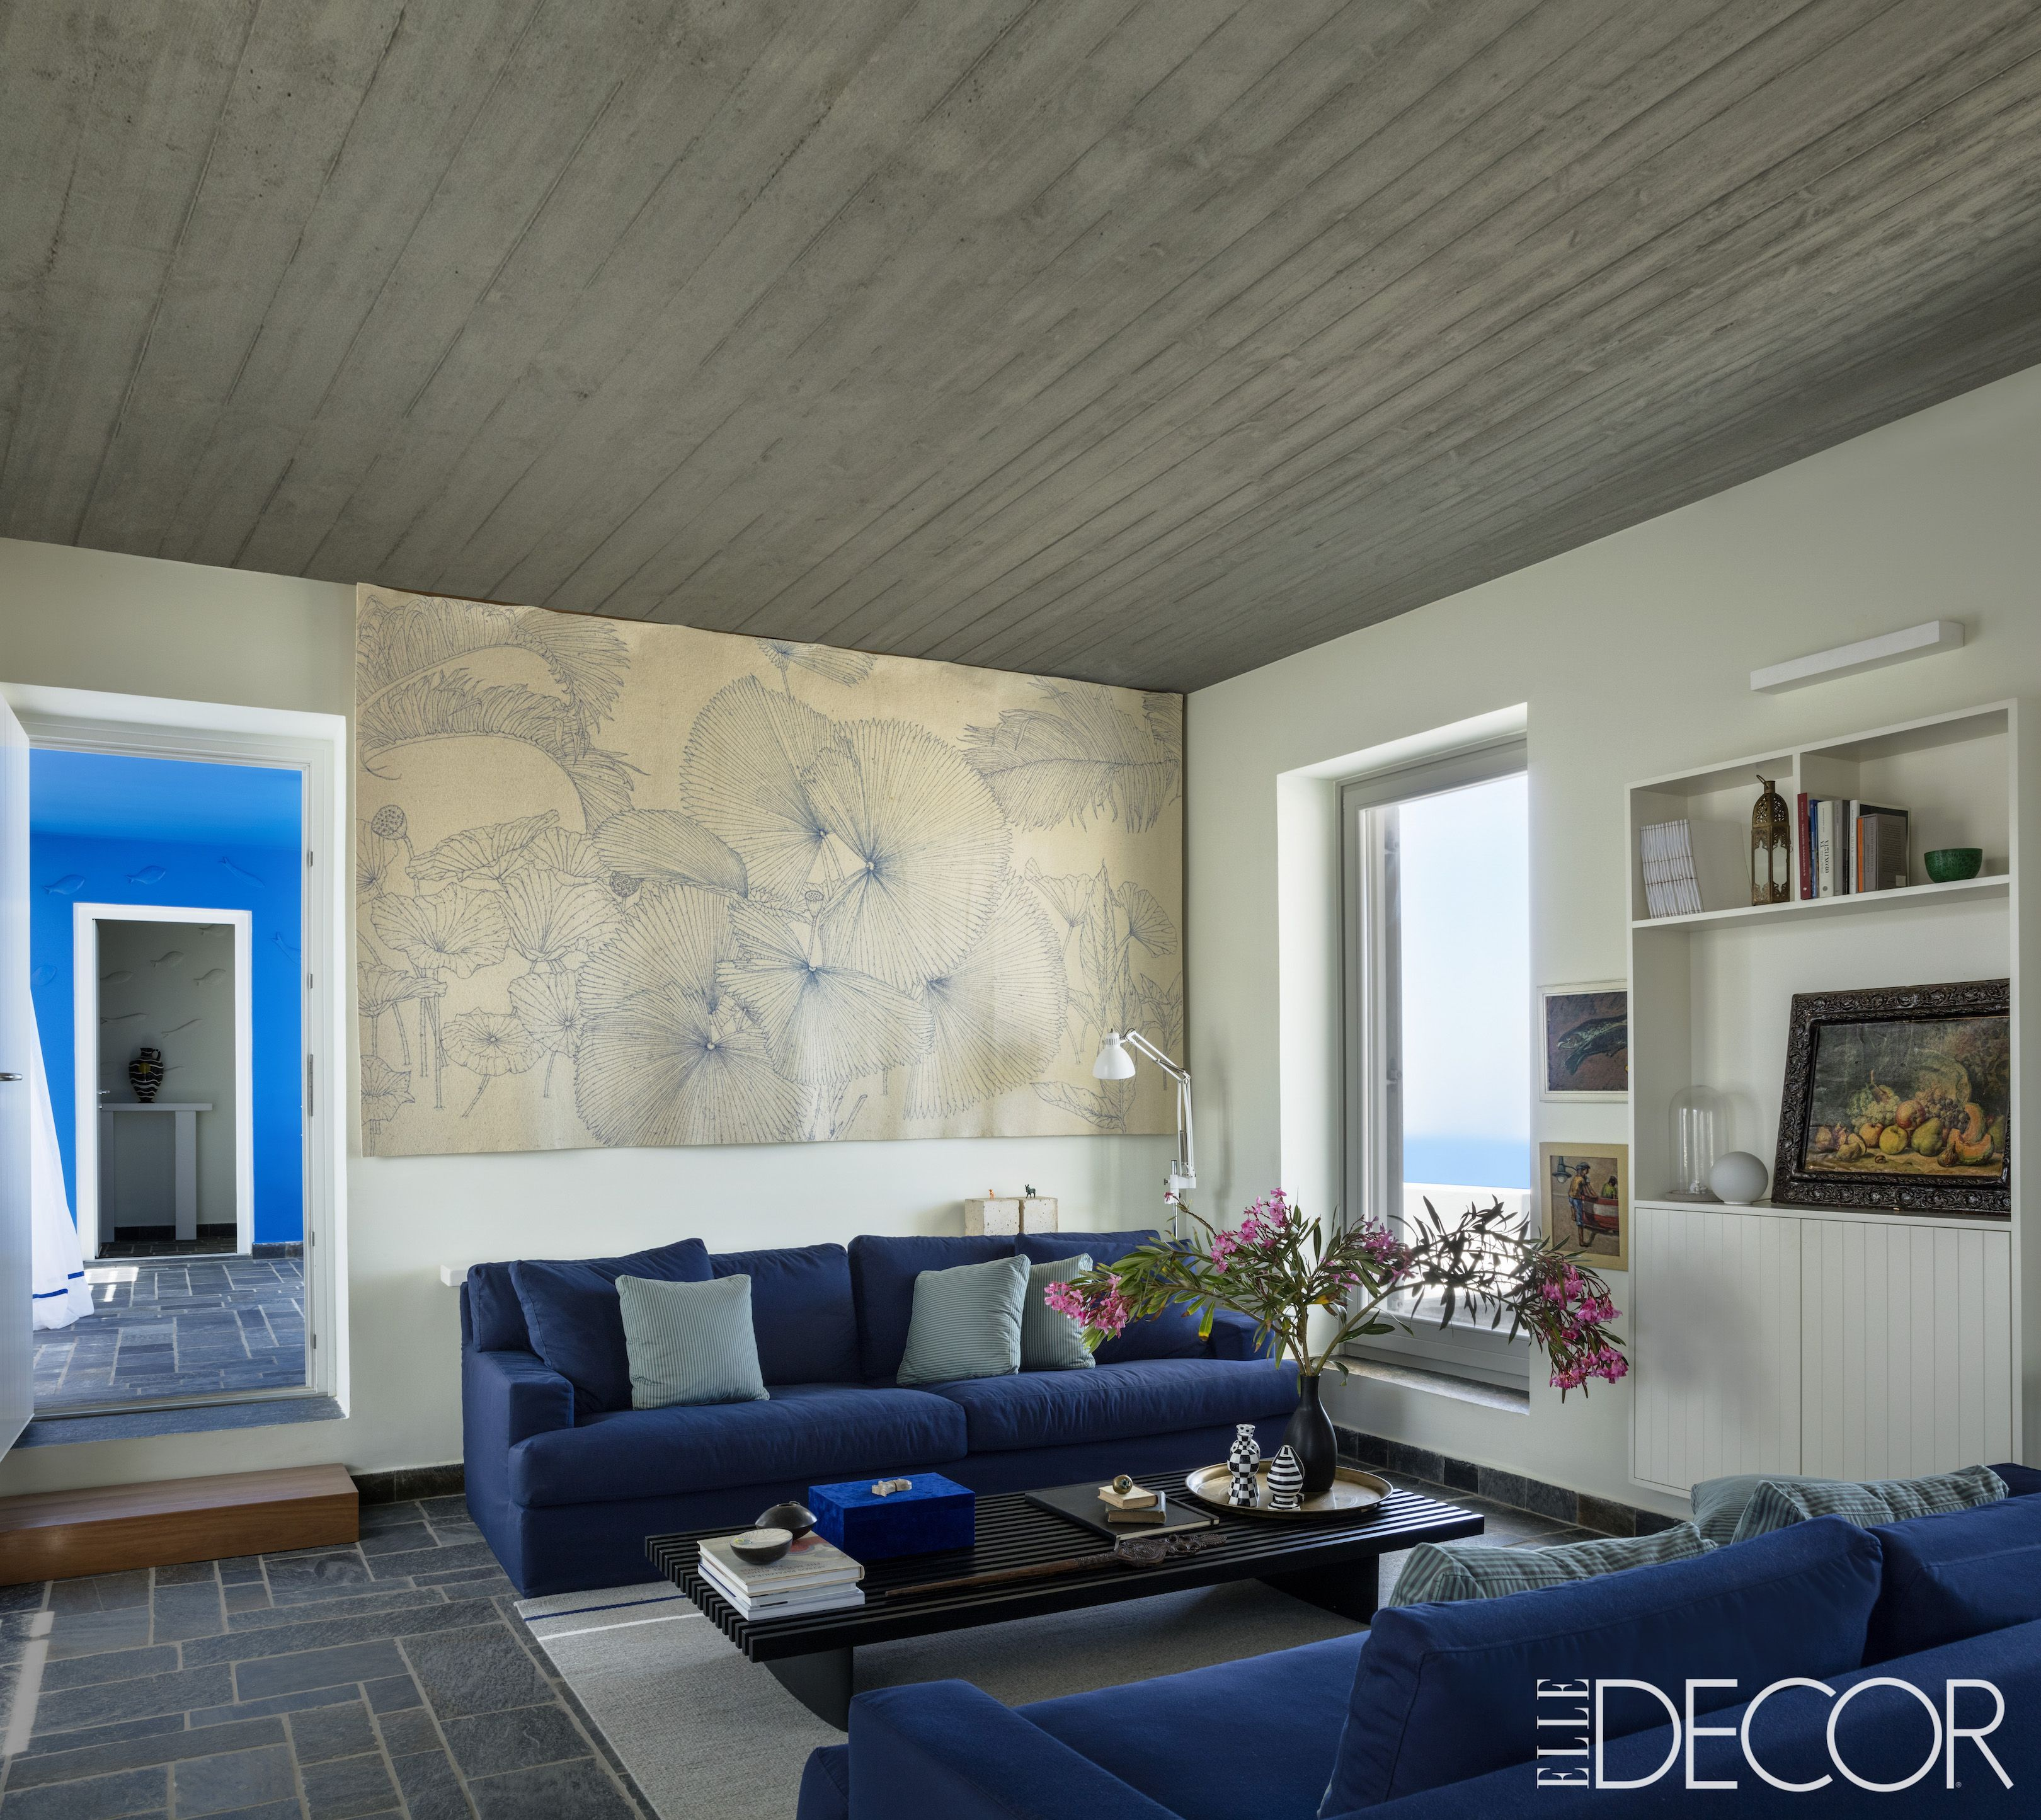 Best Living Room Ideas - Beautiful Living Room Decor & 50 Blue Room Decorating Ideas - How to Use Blue Wall Paint \u0026 Decor